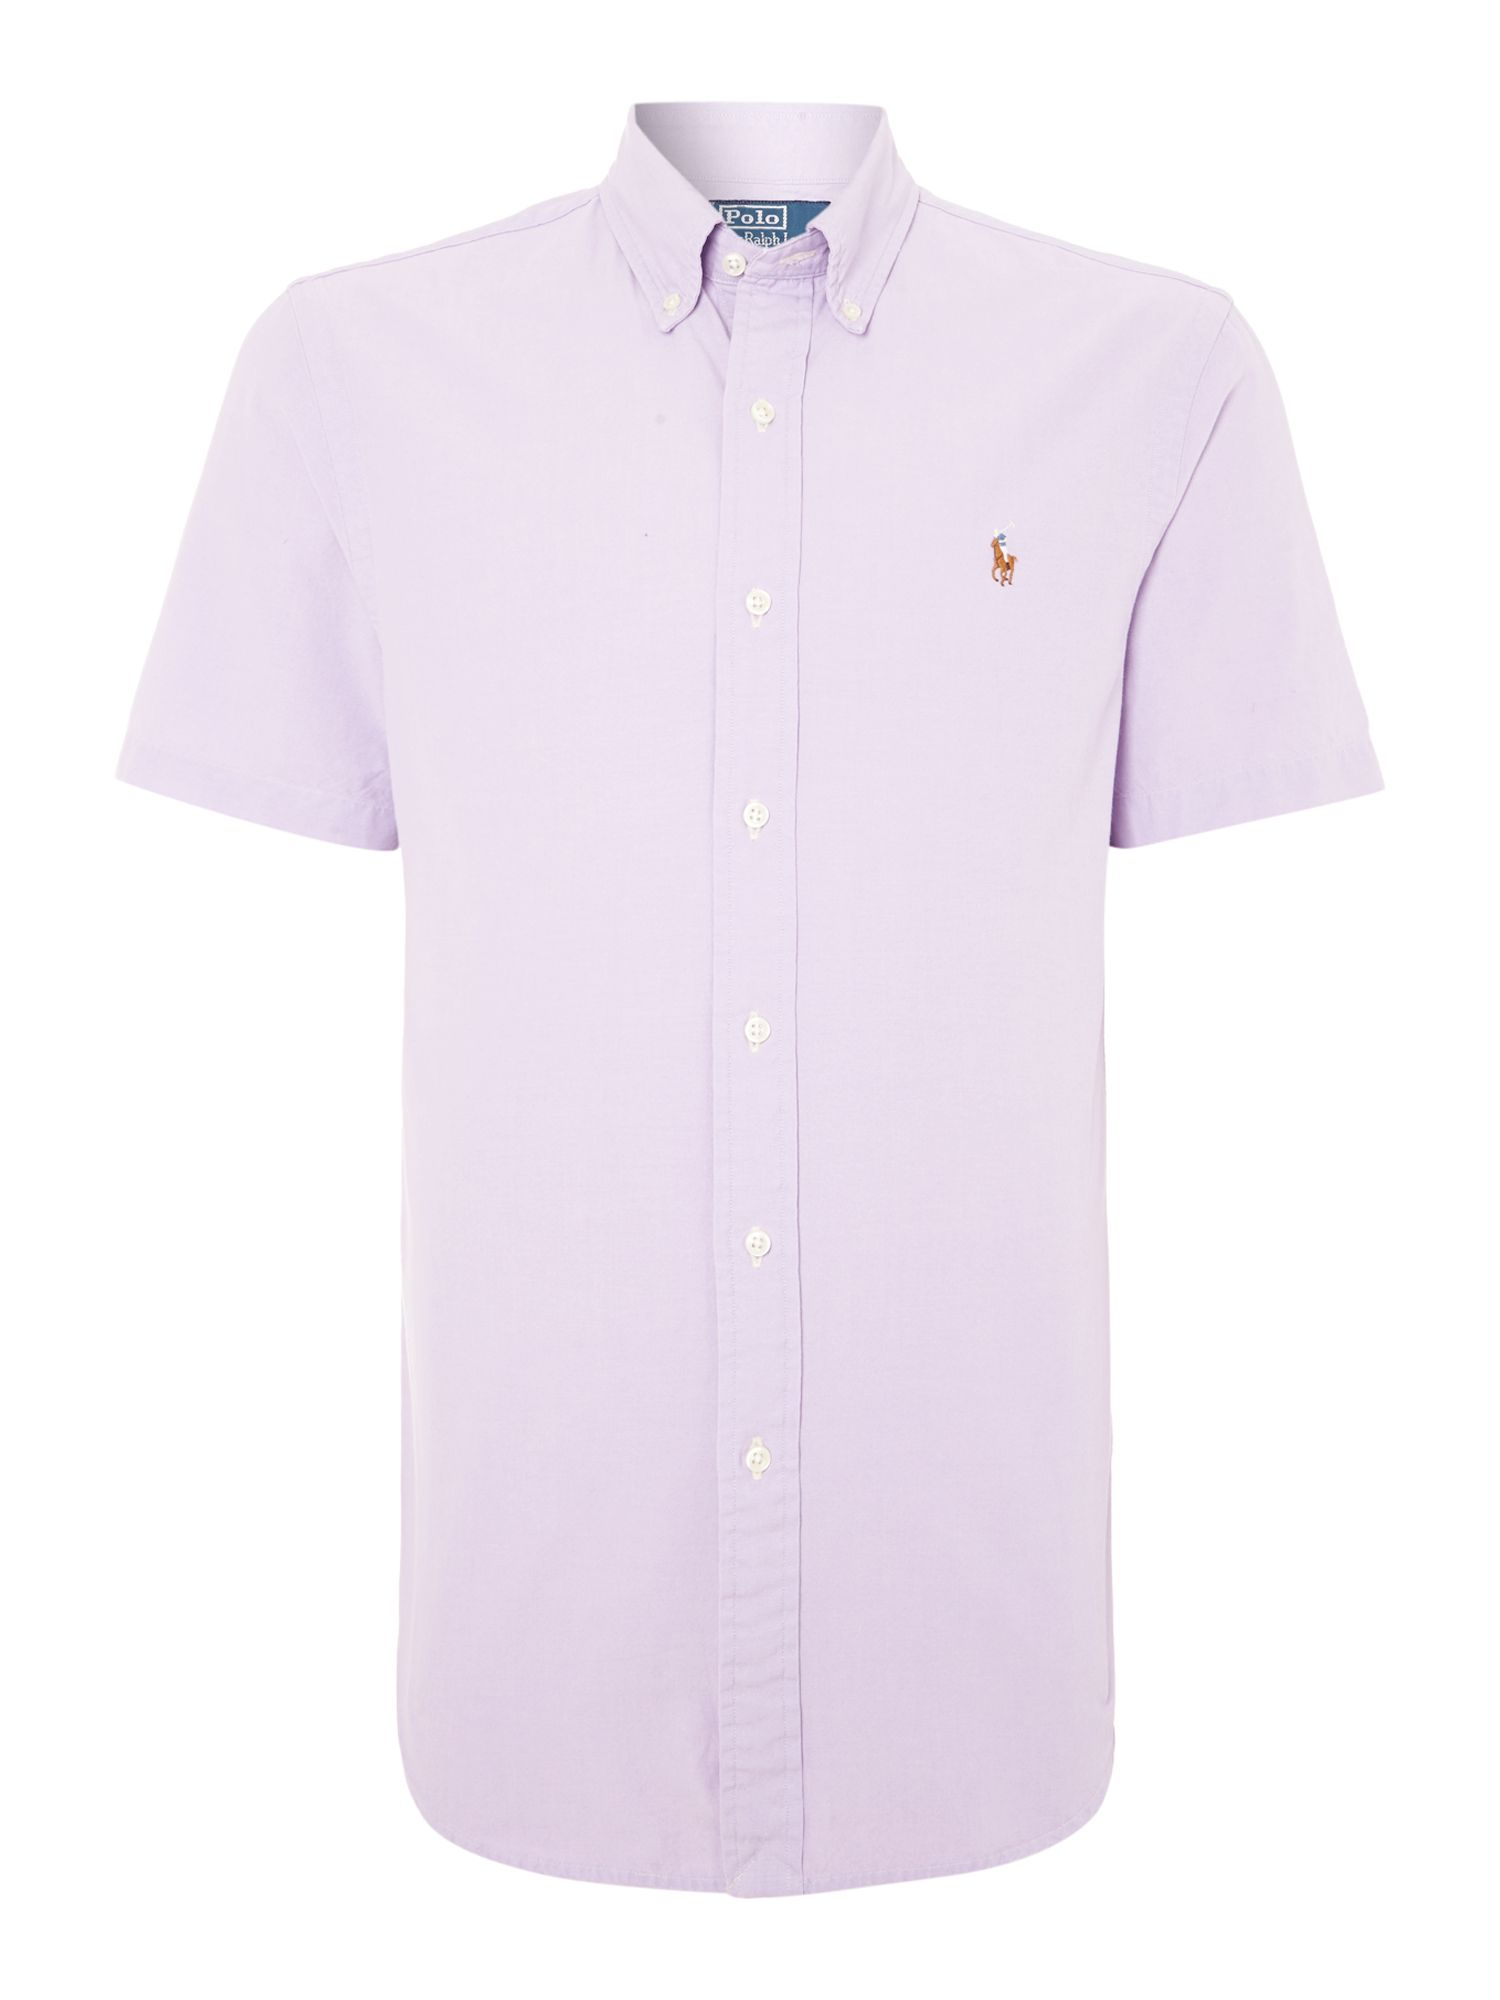 Polo Ralph Lauren Classic Short Sleeve Slim Fit Shirt In